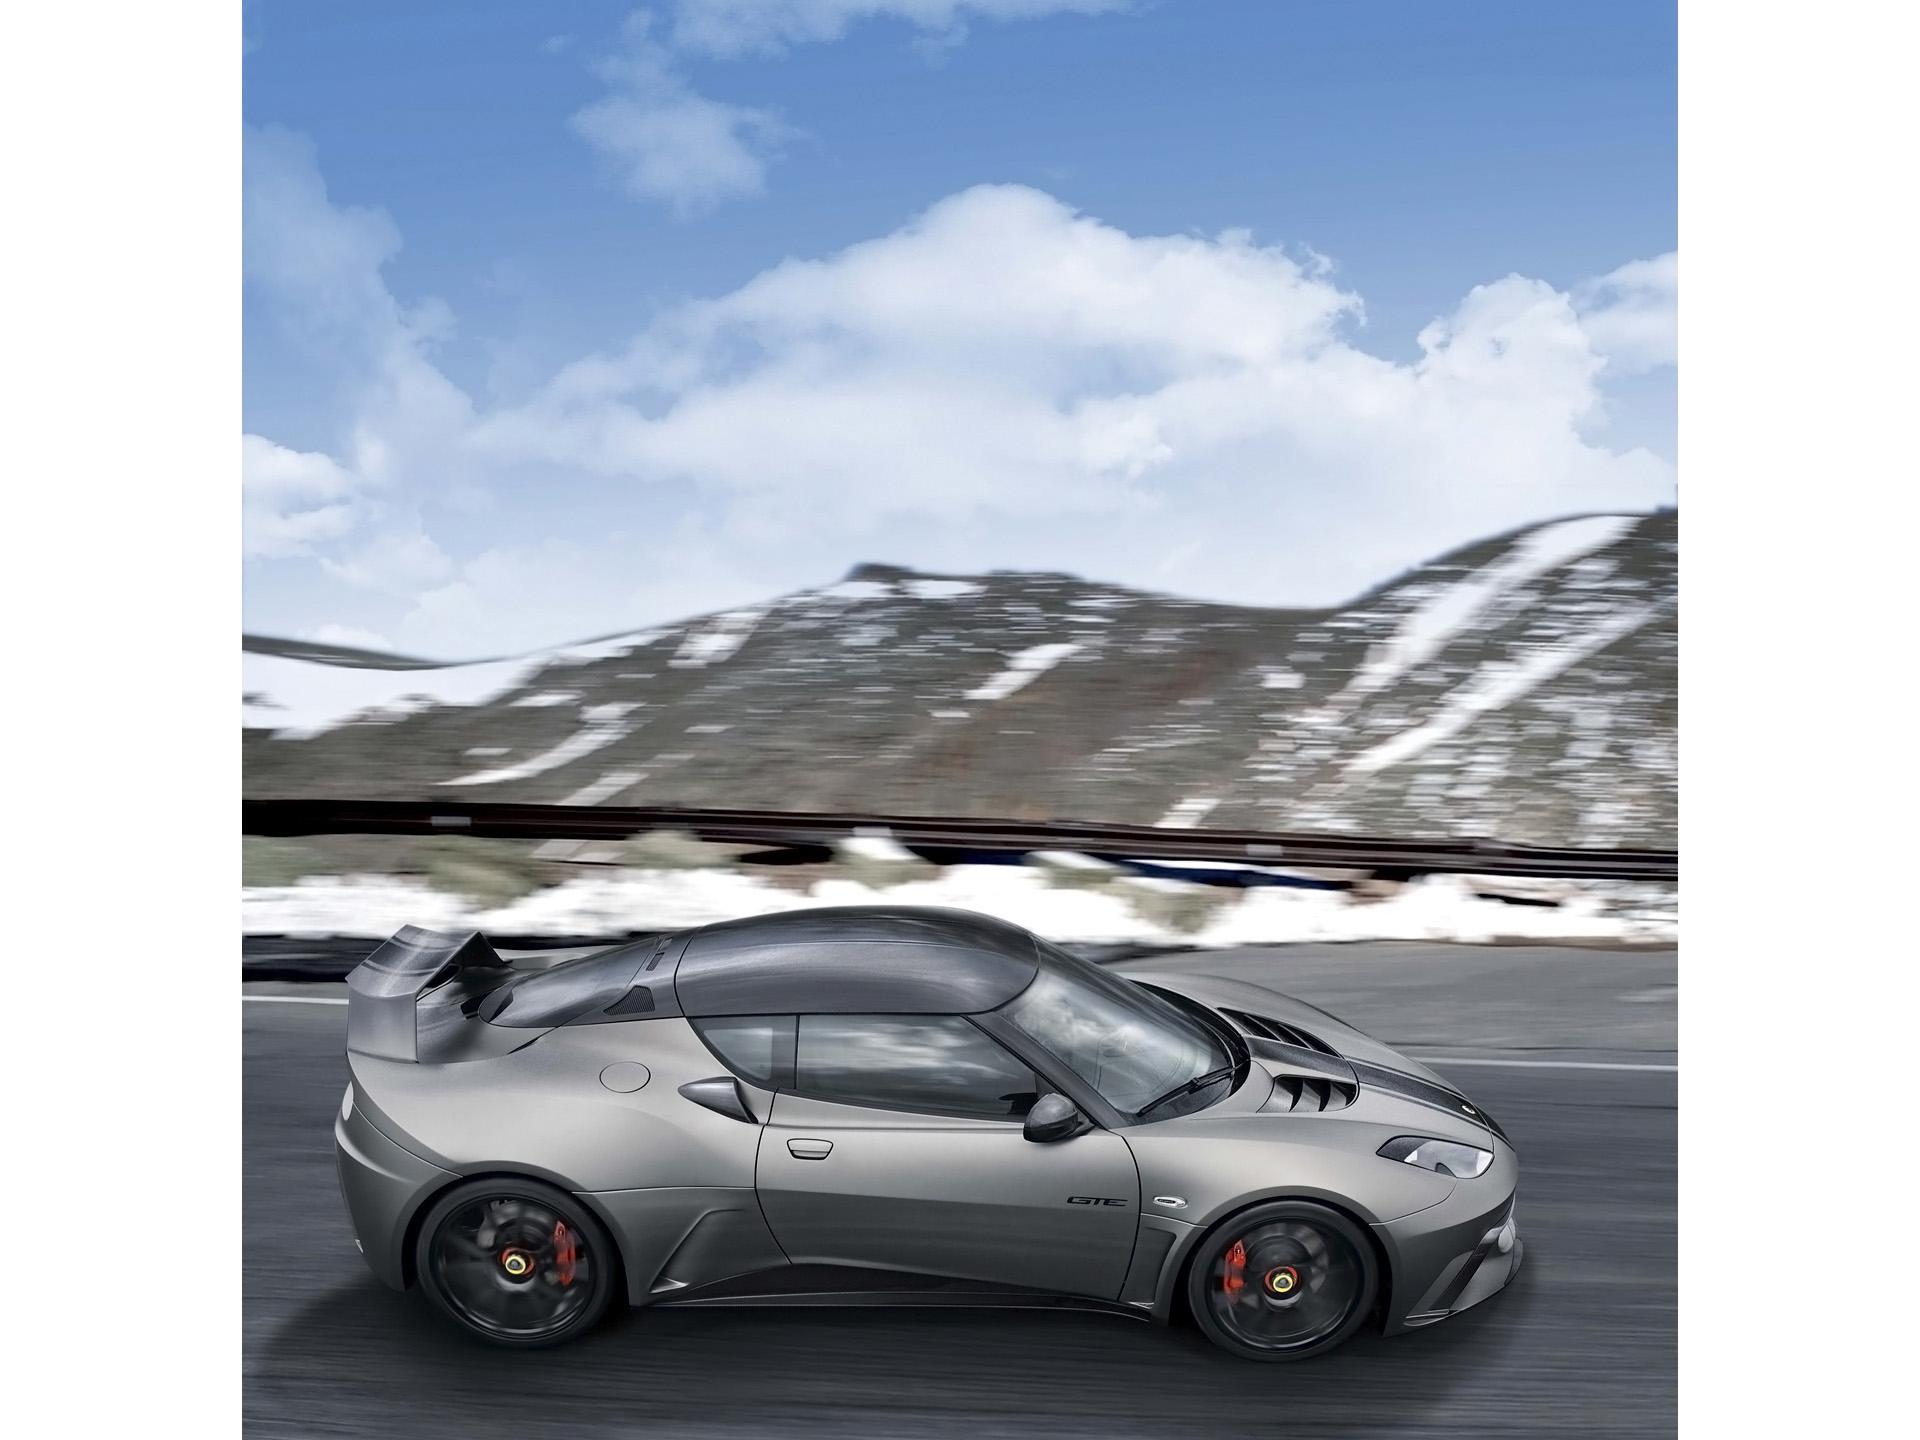 2012 Lotus Evora GTE Road Car Concept